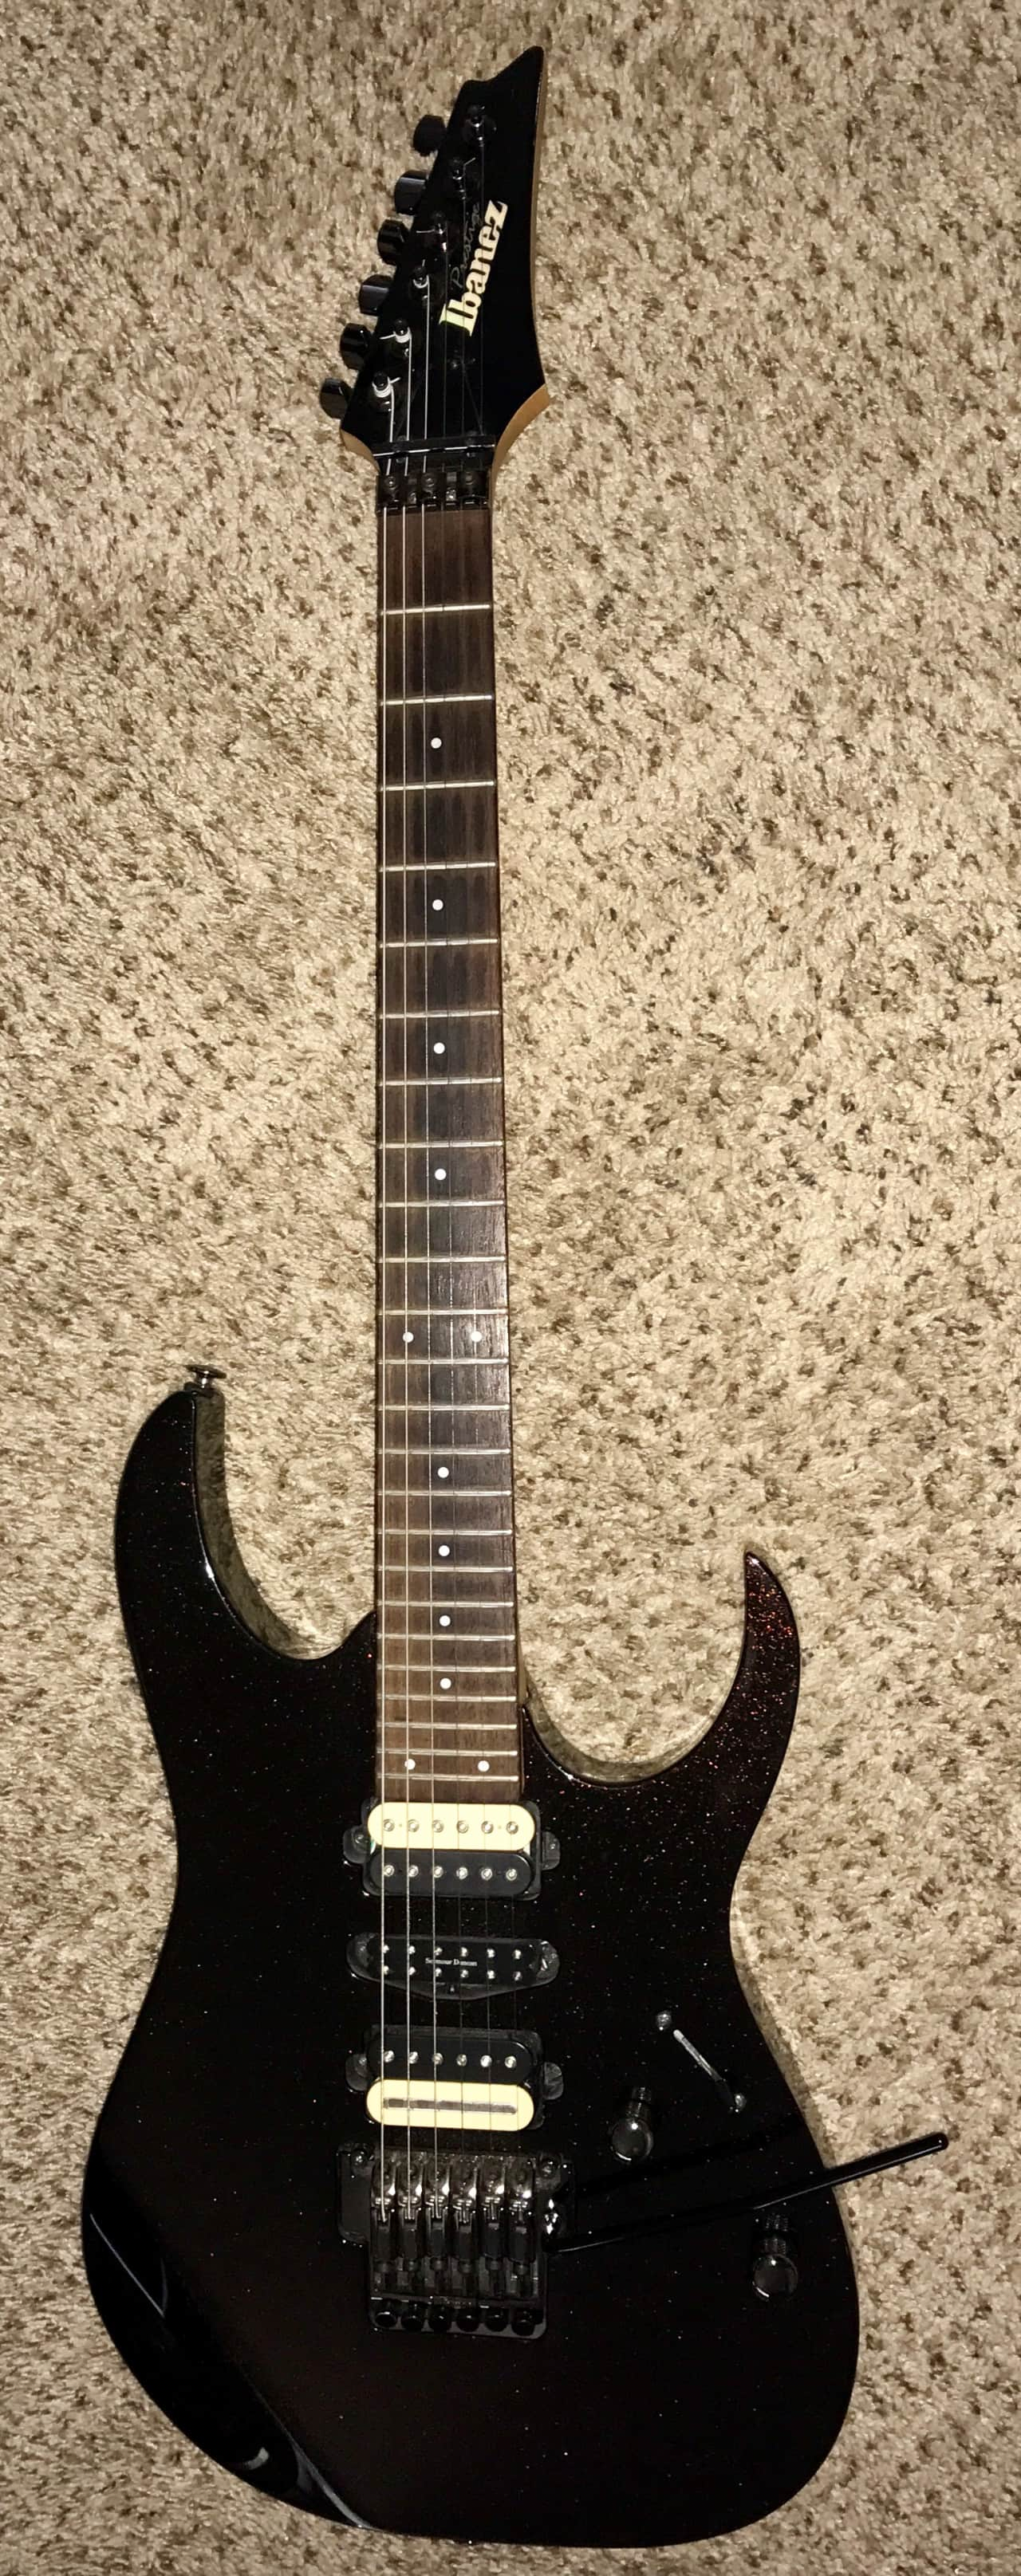 Ibanez team j craft prestige rg 1570 electric guitar made for Ibanez prestige team j craft